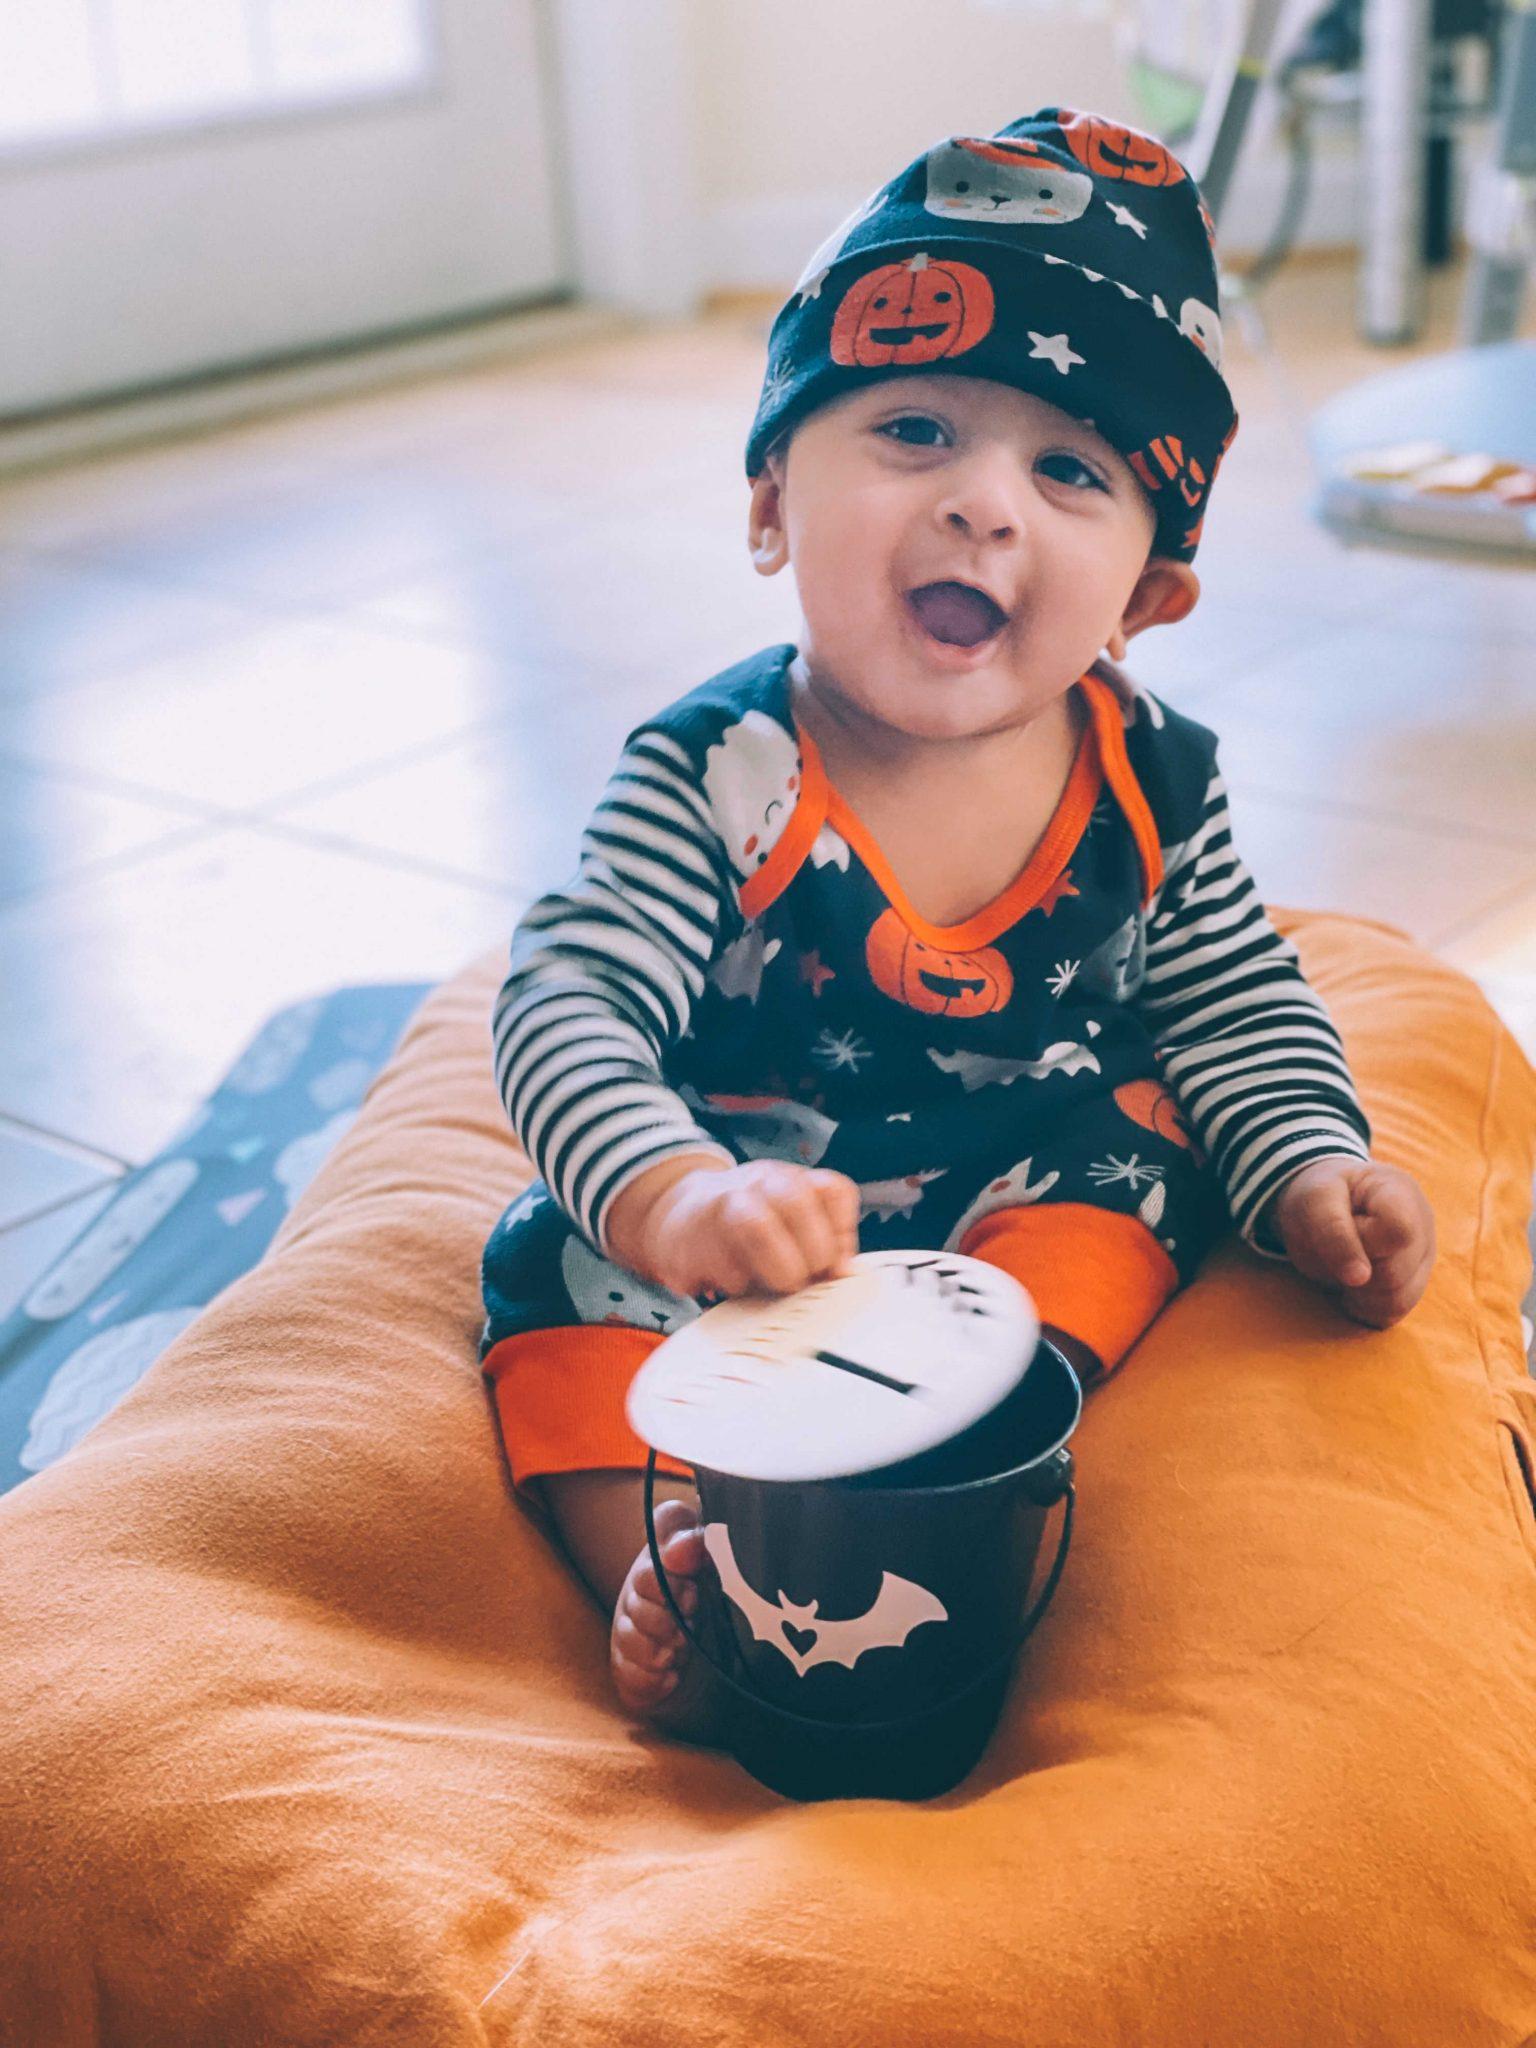 Baby V 7 months birthday Update5